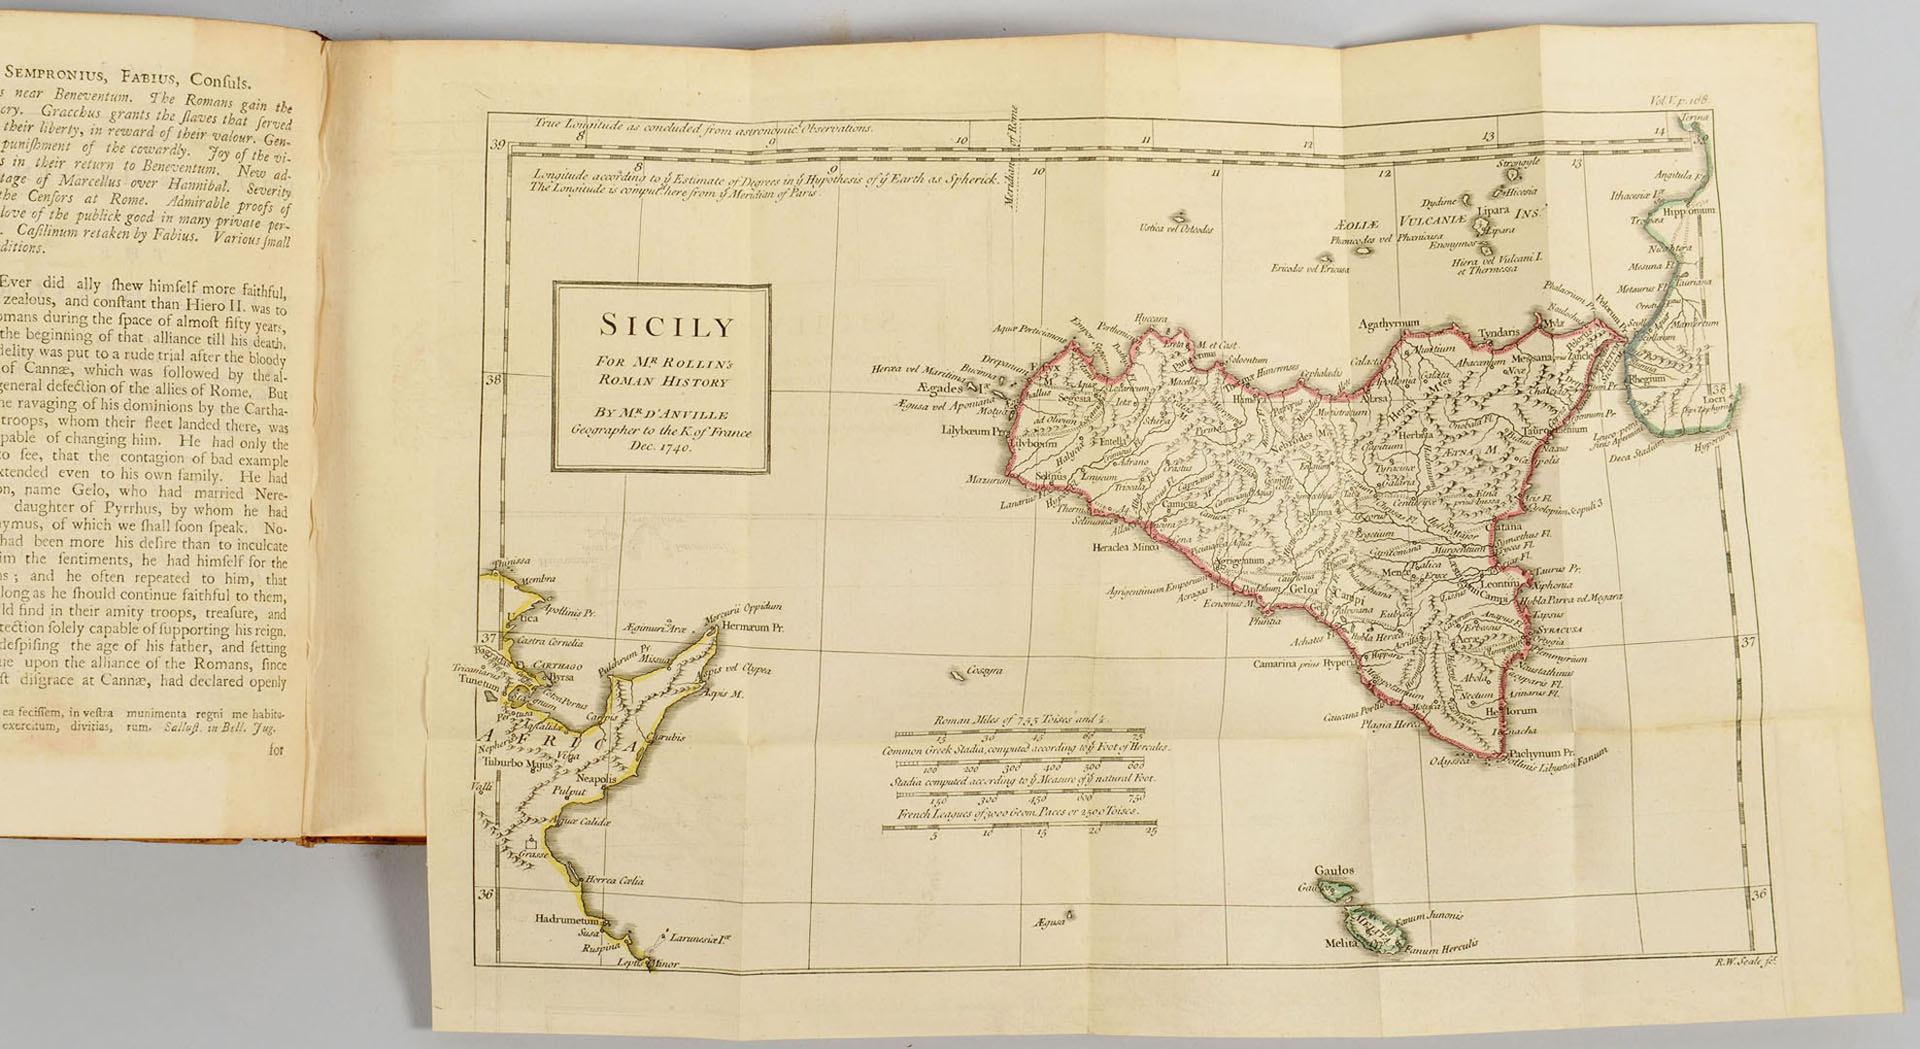 Lot 606: Rollin's Roman History, 16 vols.